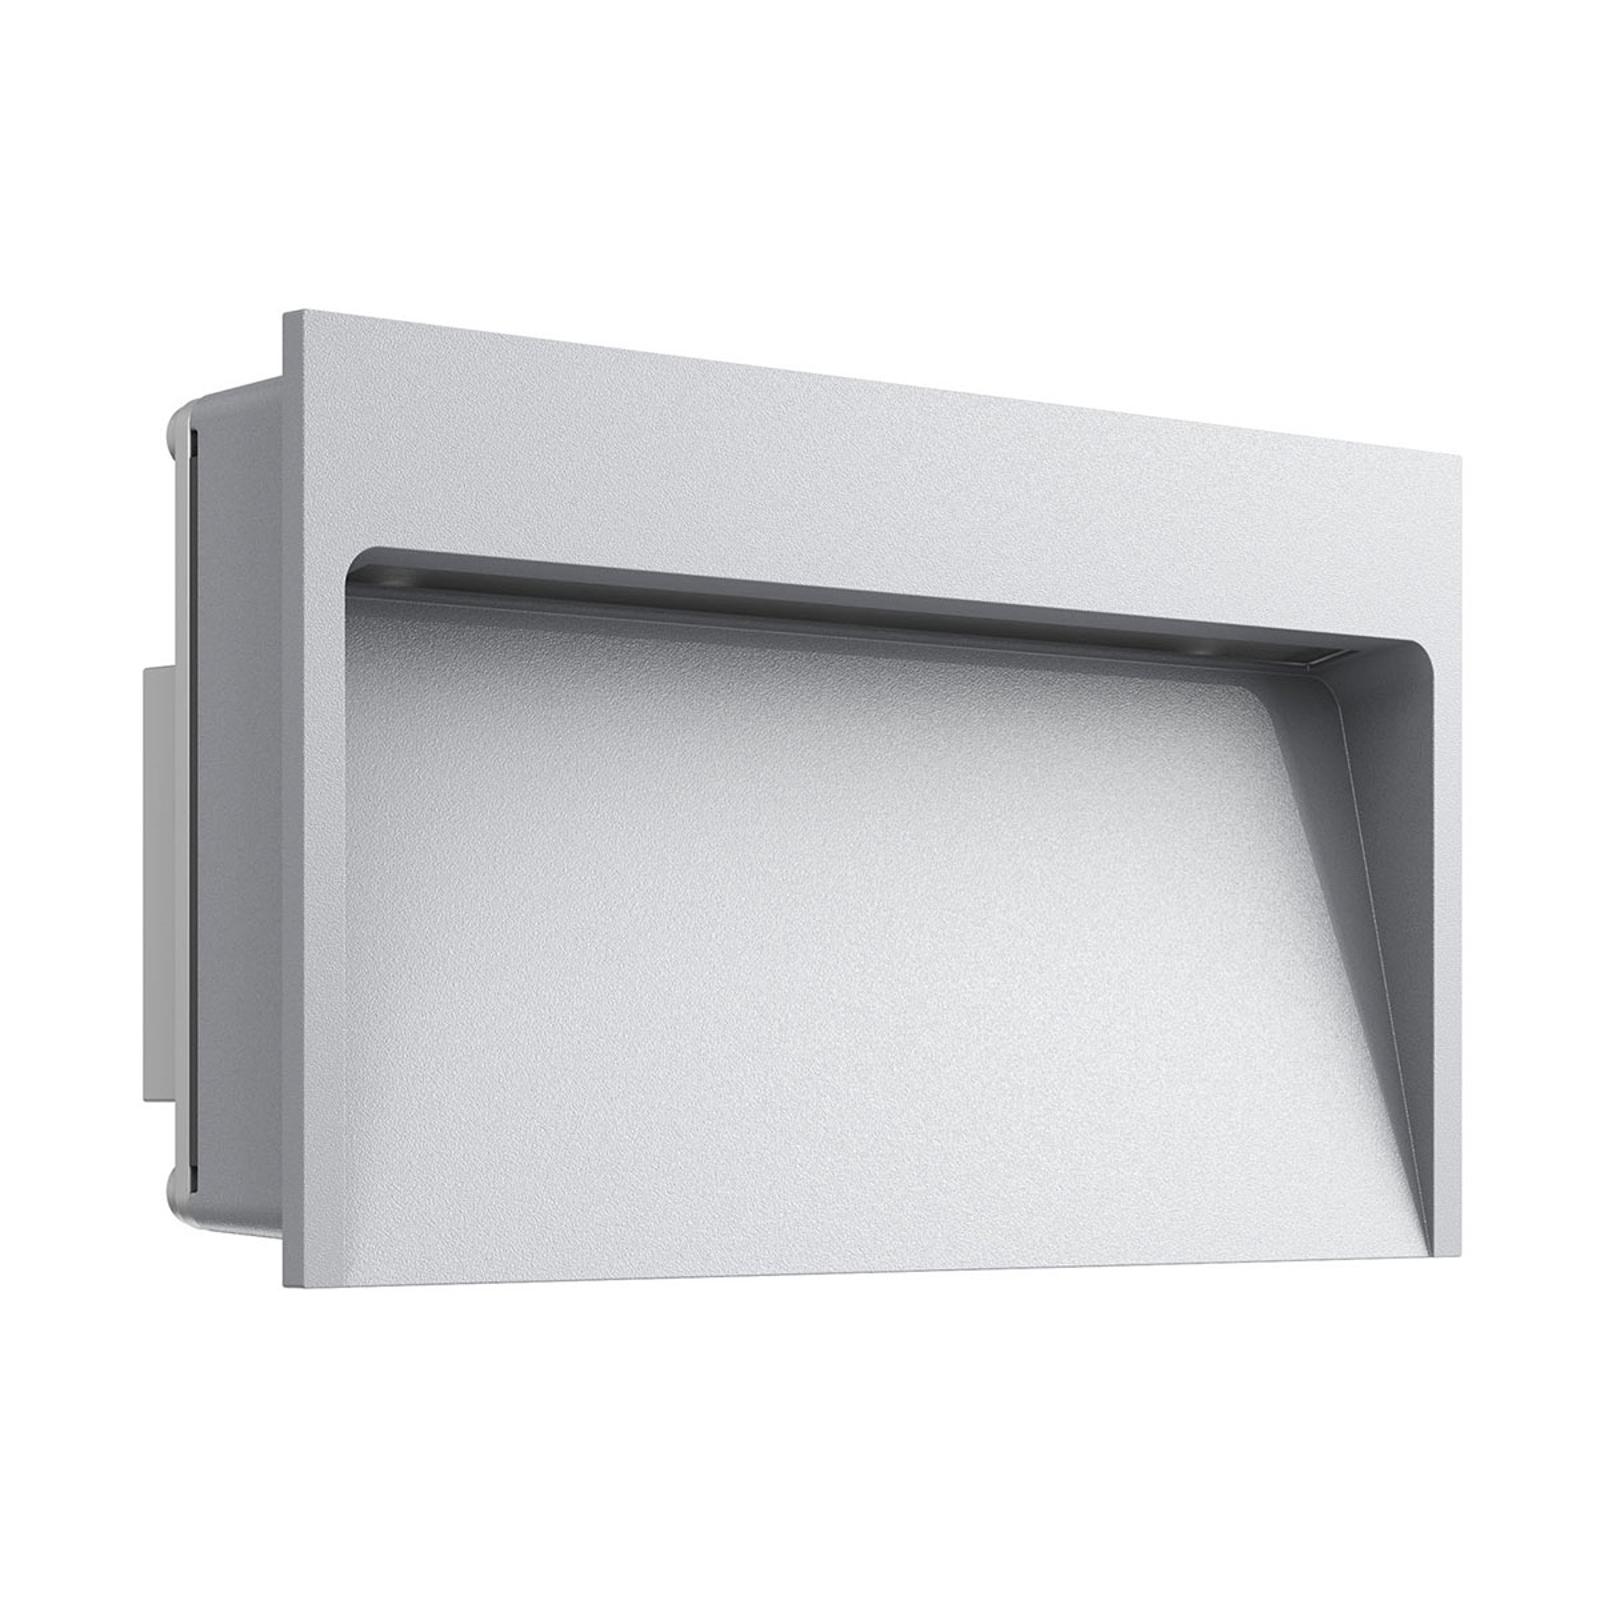 Bred LED vægindbygningslampe My Way, grå